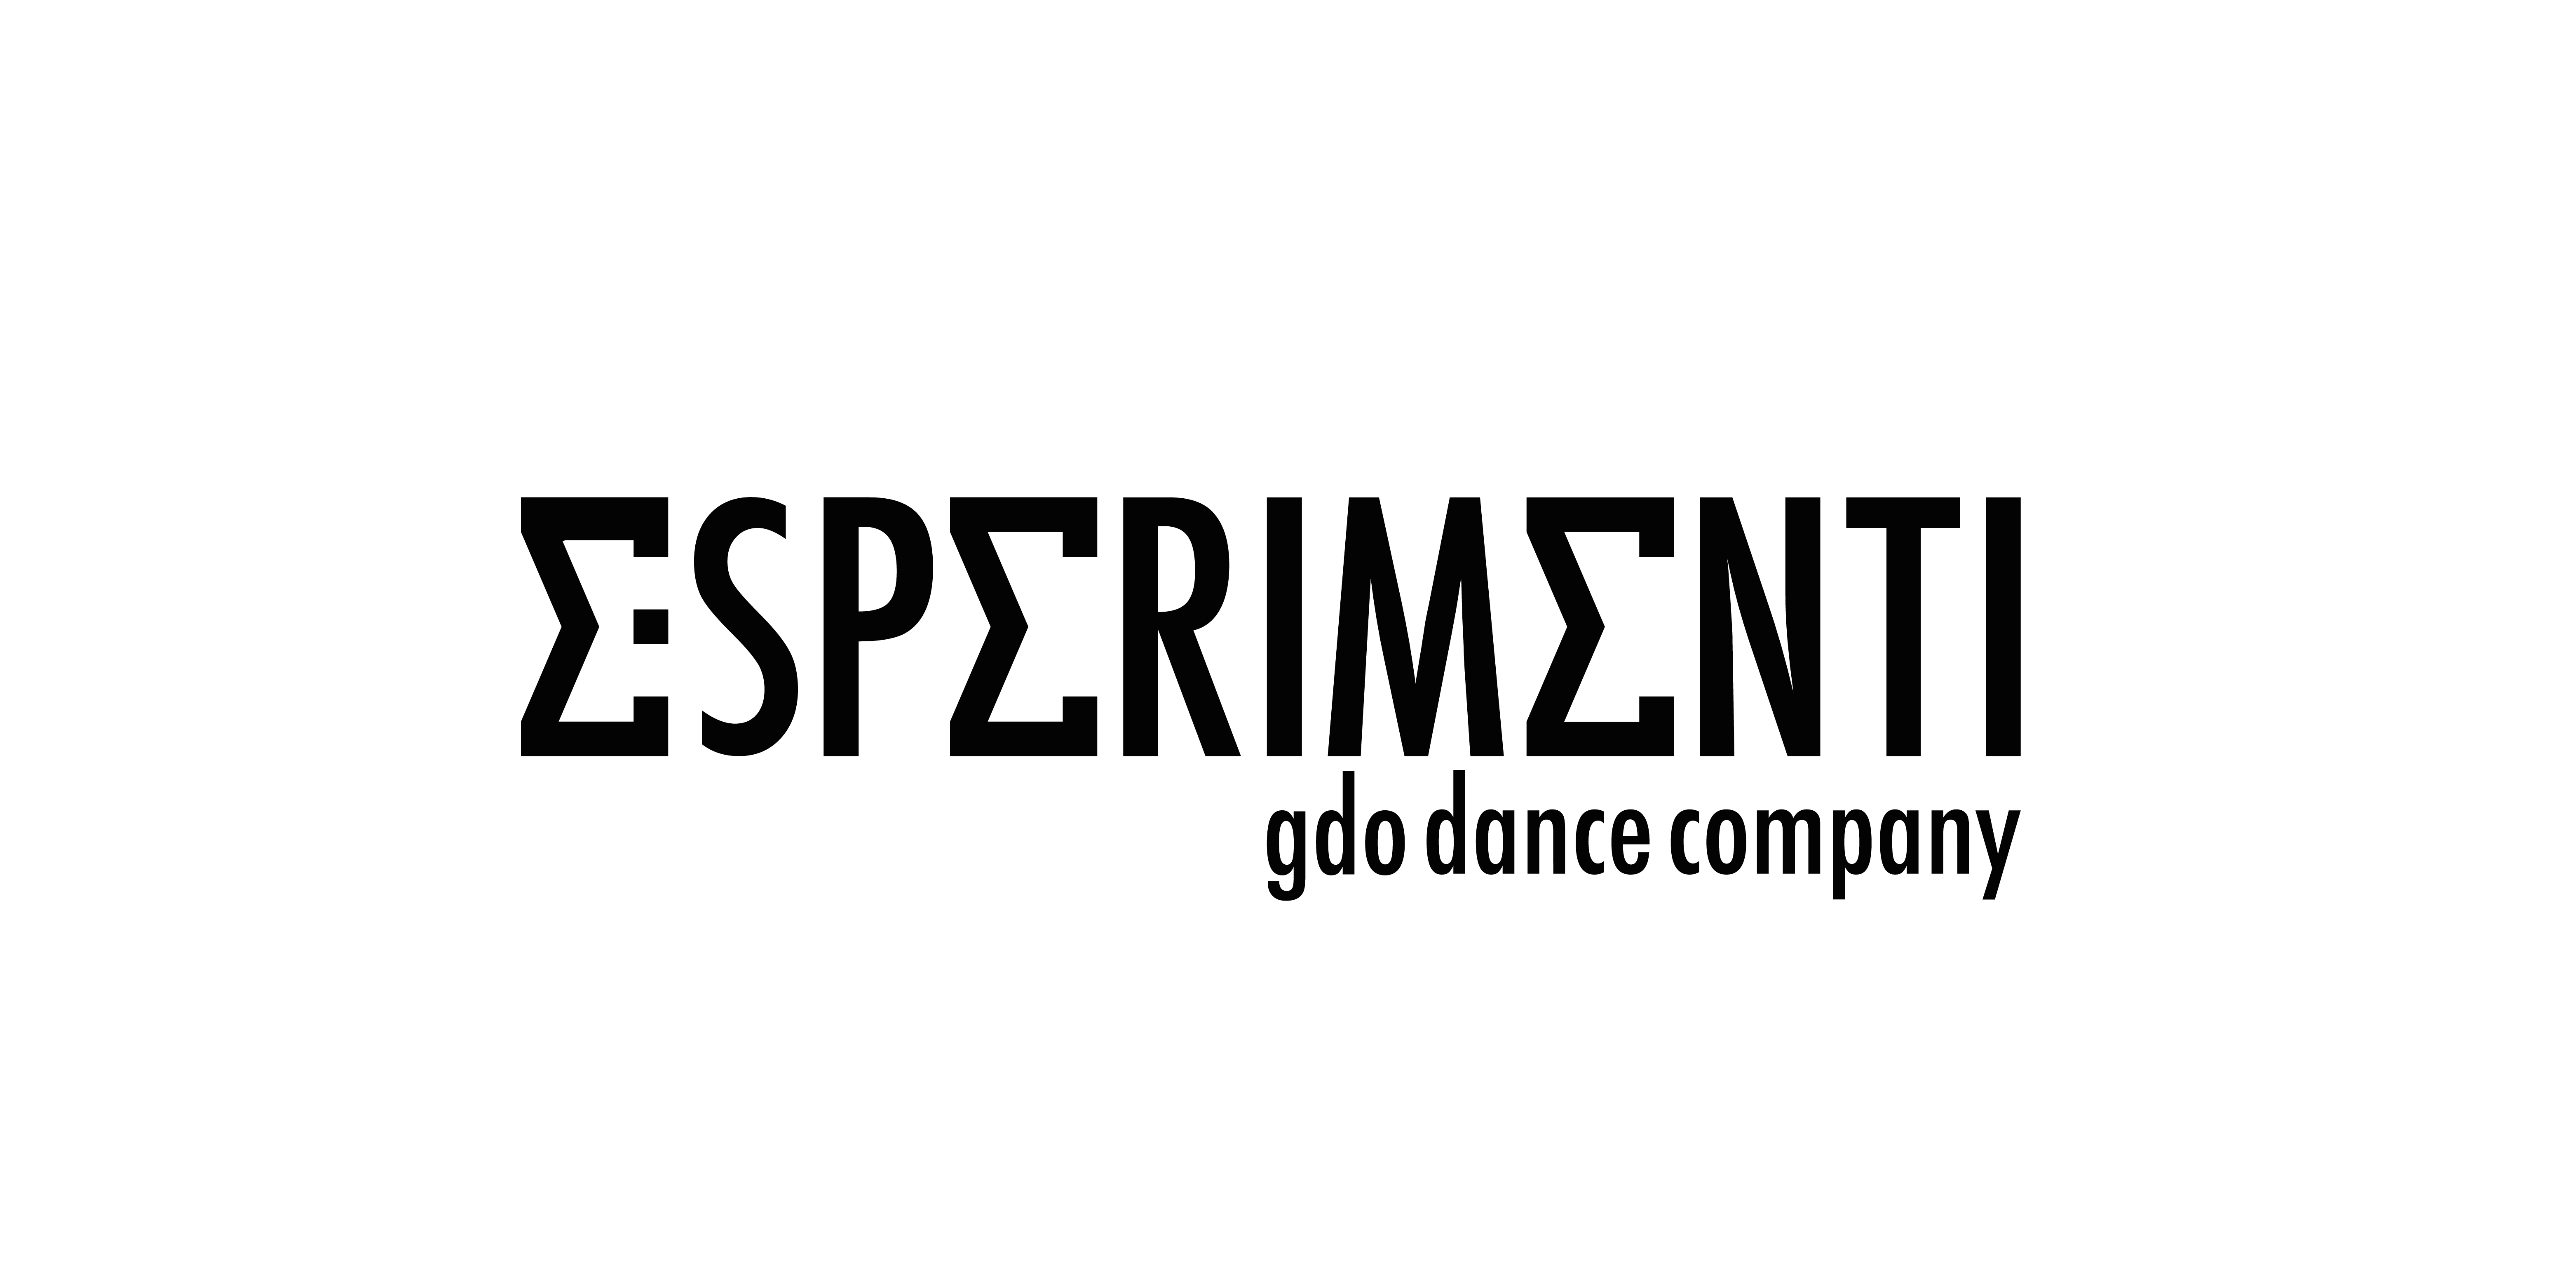 Brand Noii - E.sperimenti